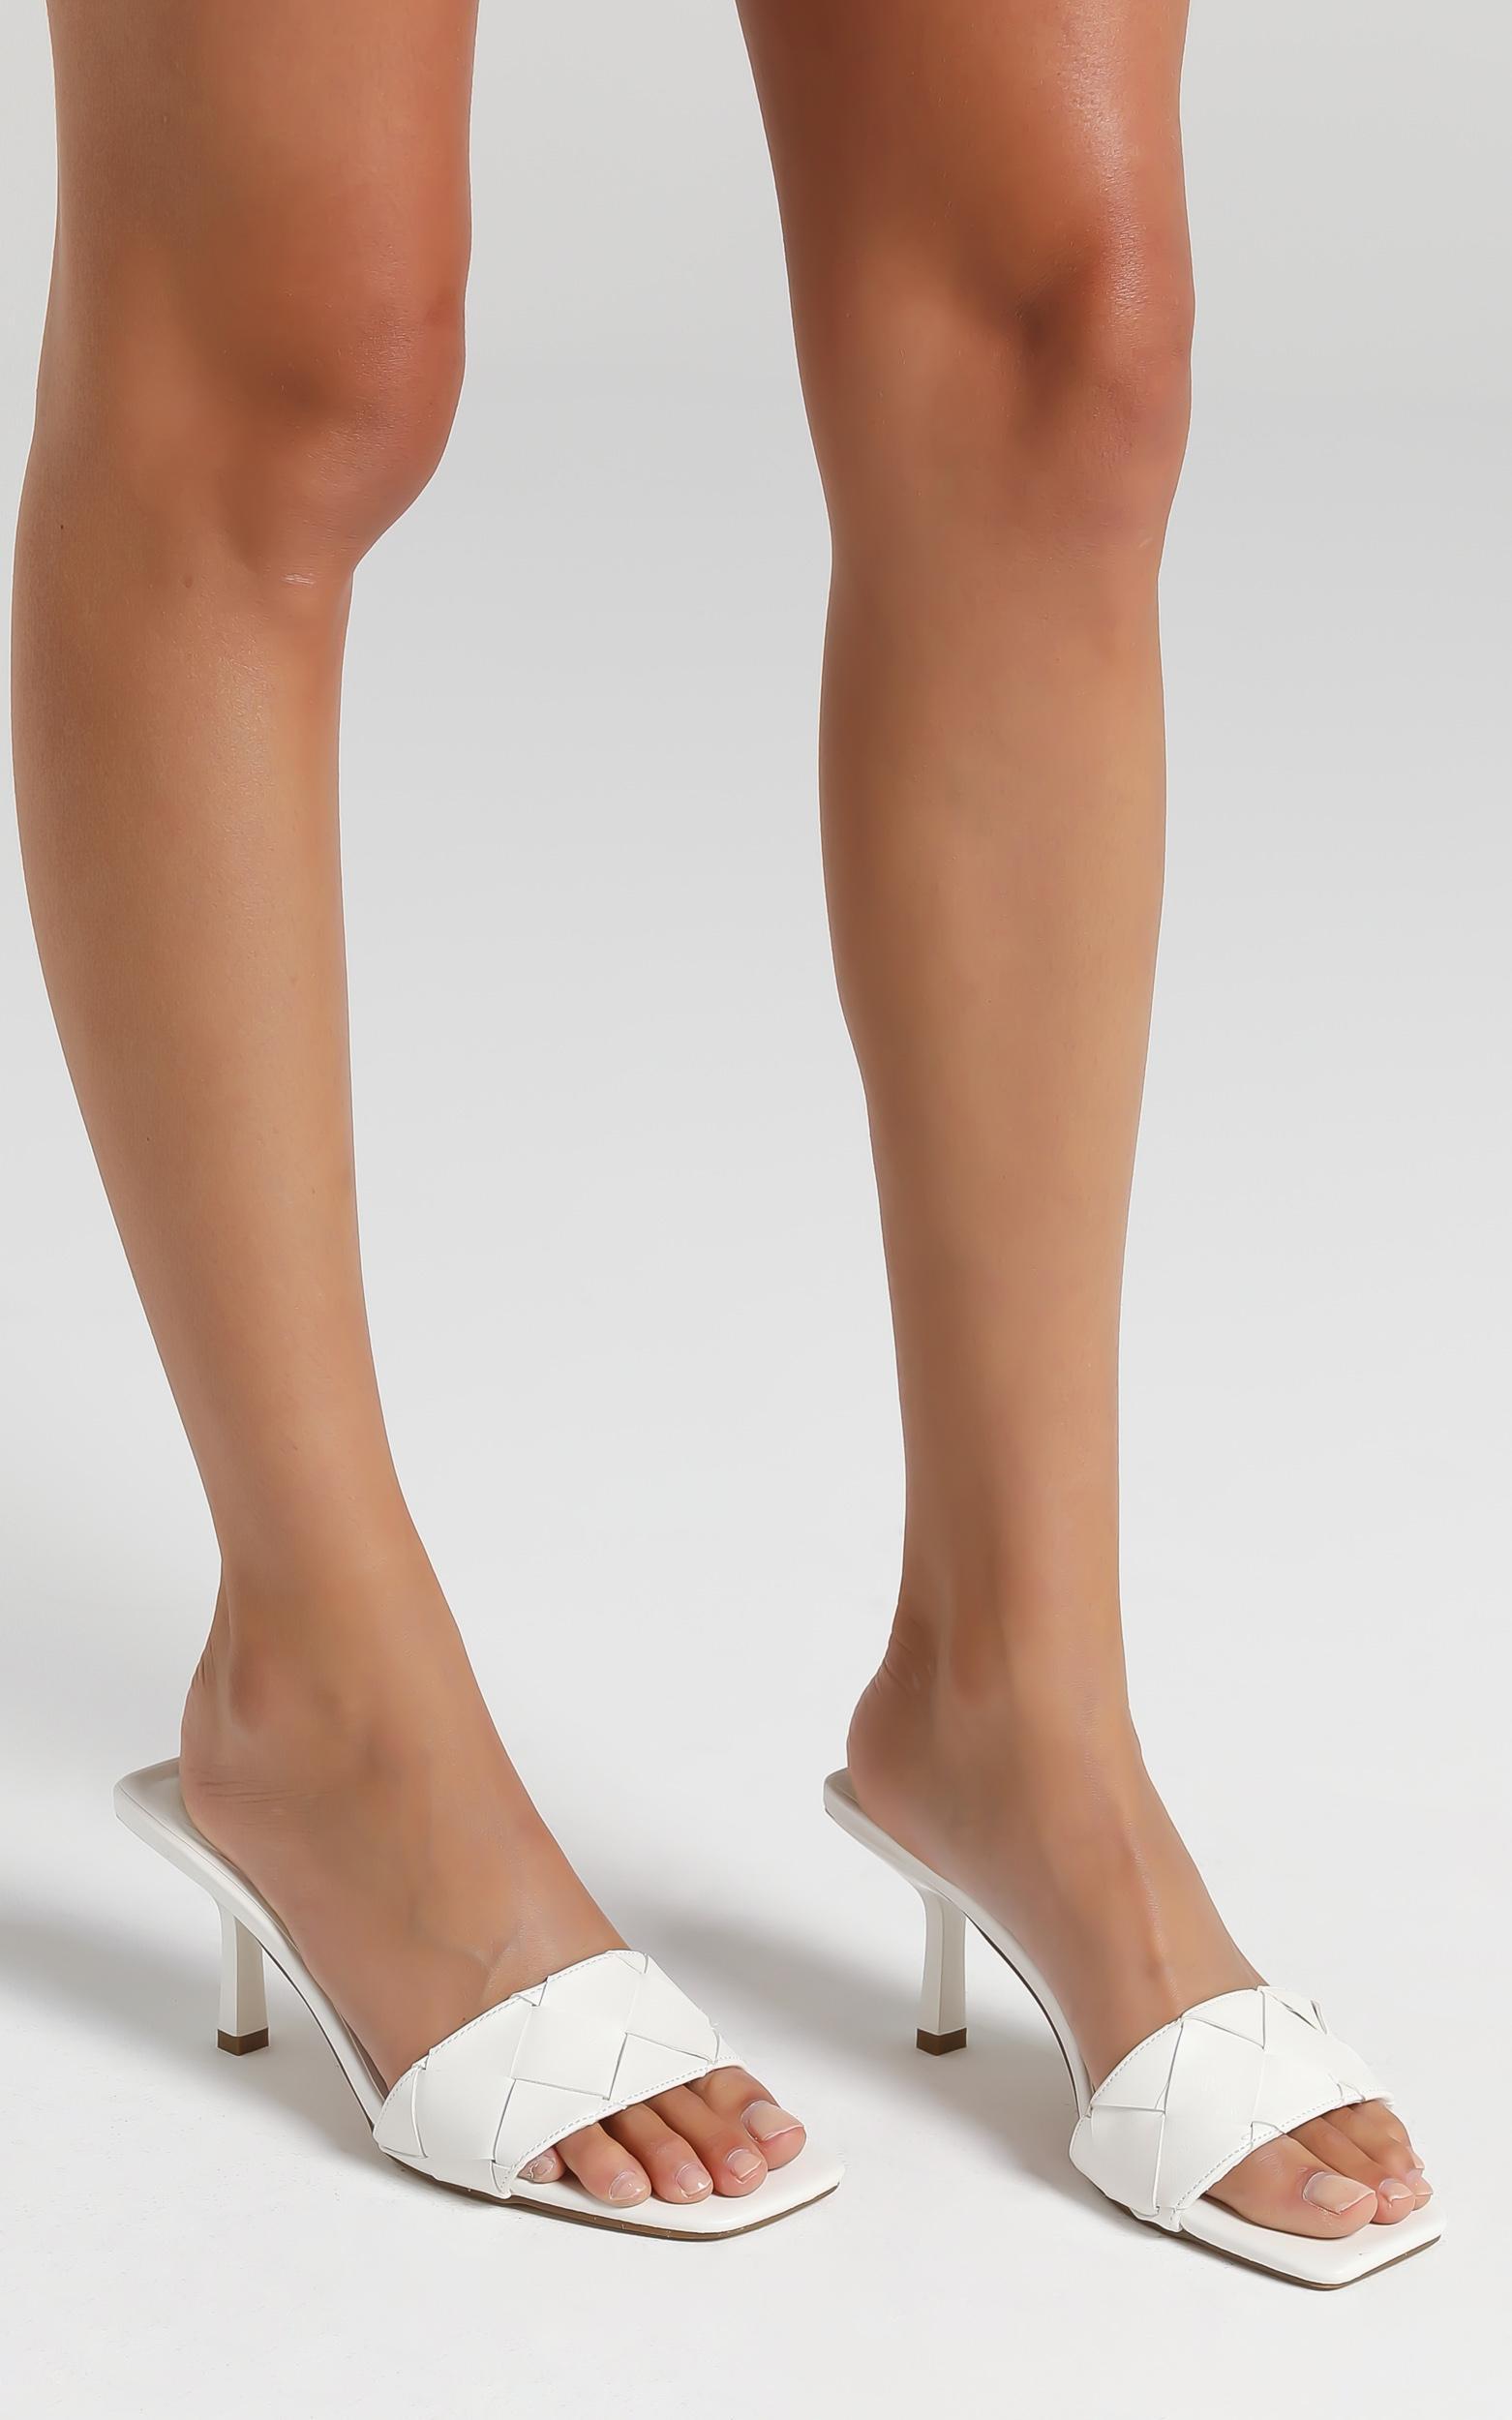 Billini - India Heels in White - 05, WHT2, hi-res image number null